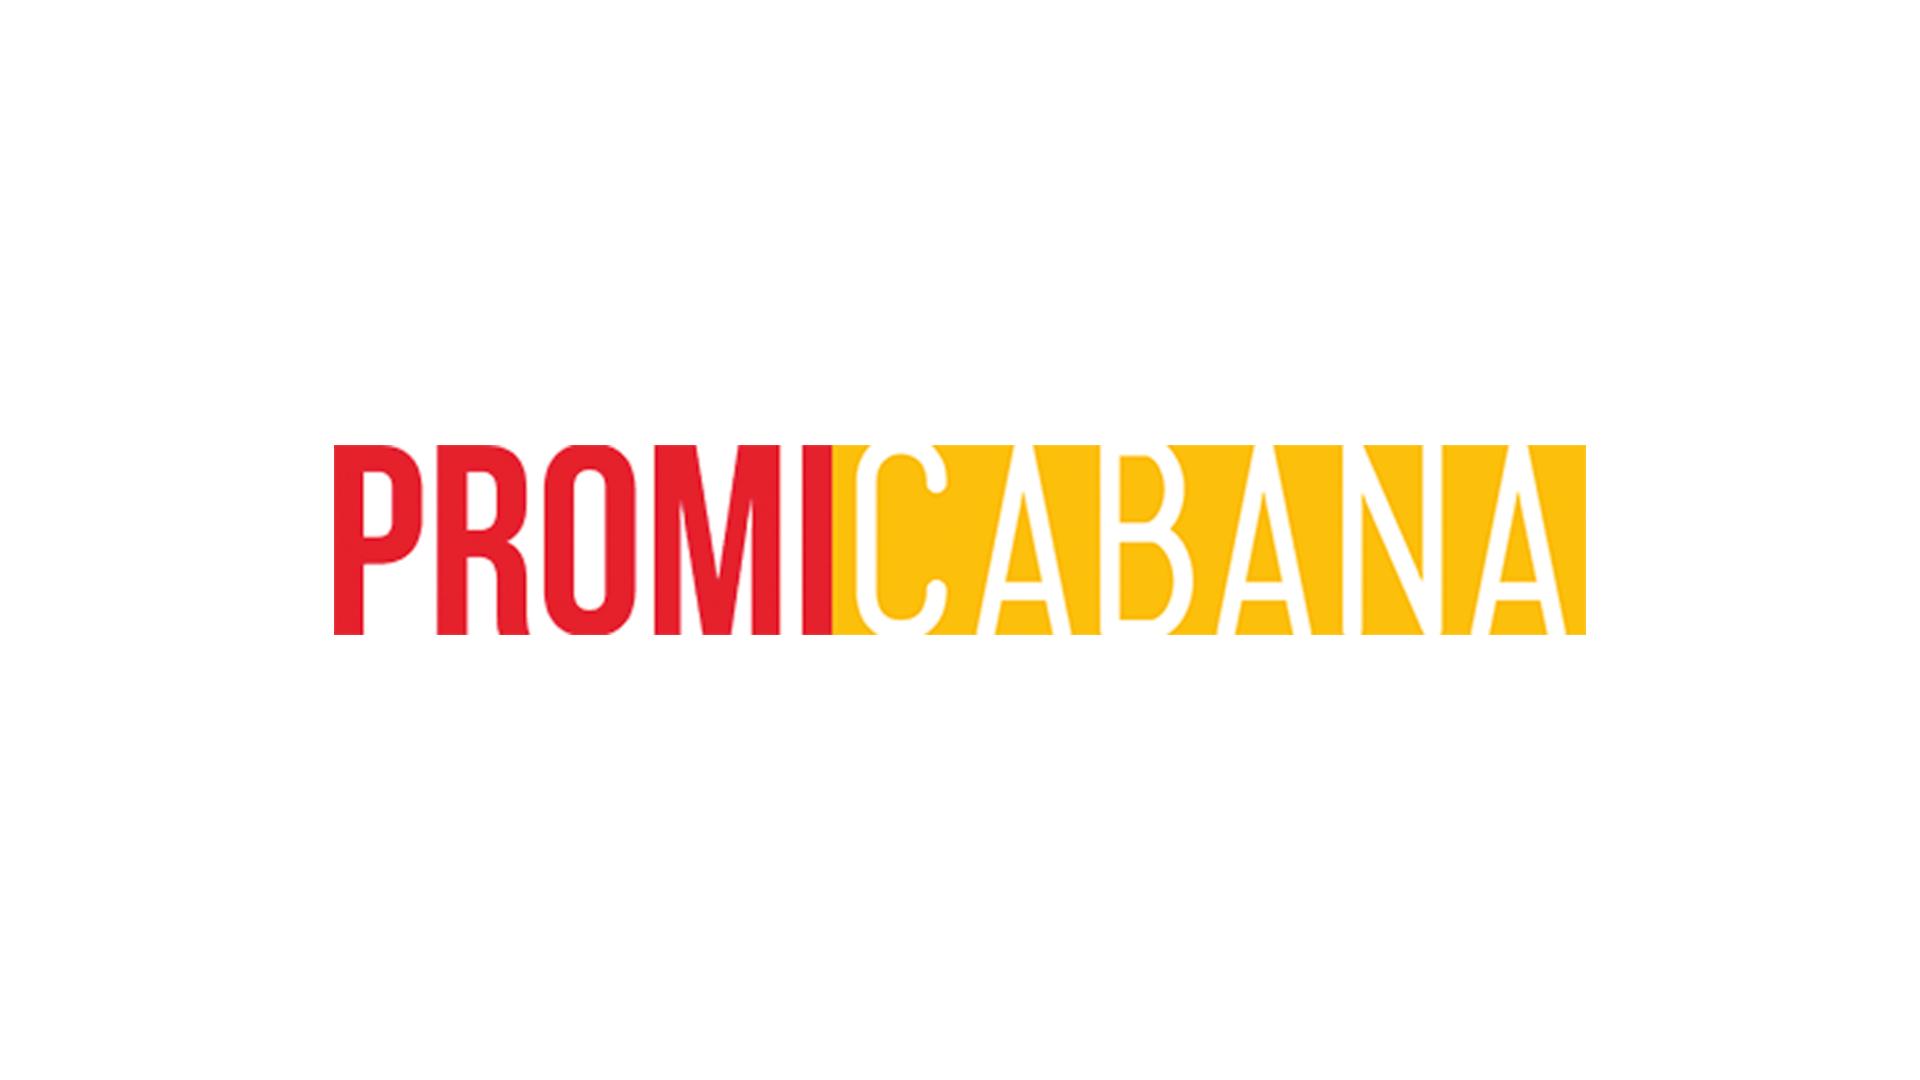 Big-Bang-Theory-Staffel-11-Verlobung-Sheldon-Amy-Antrag